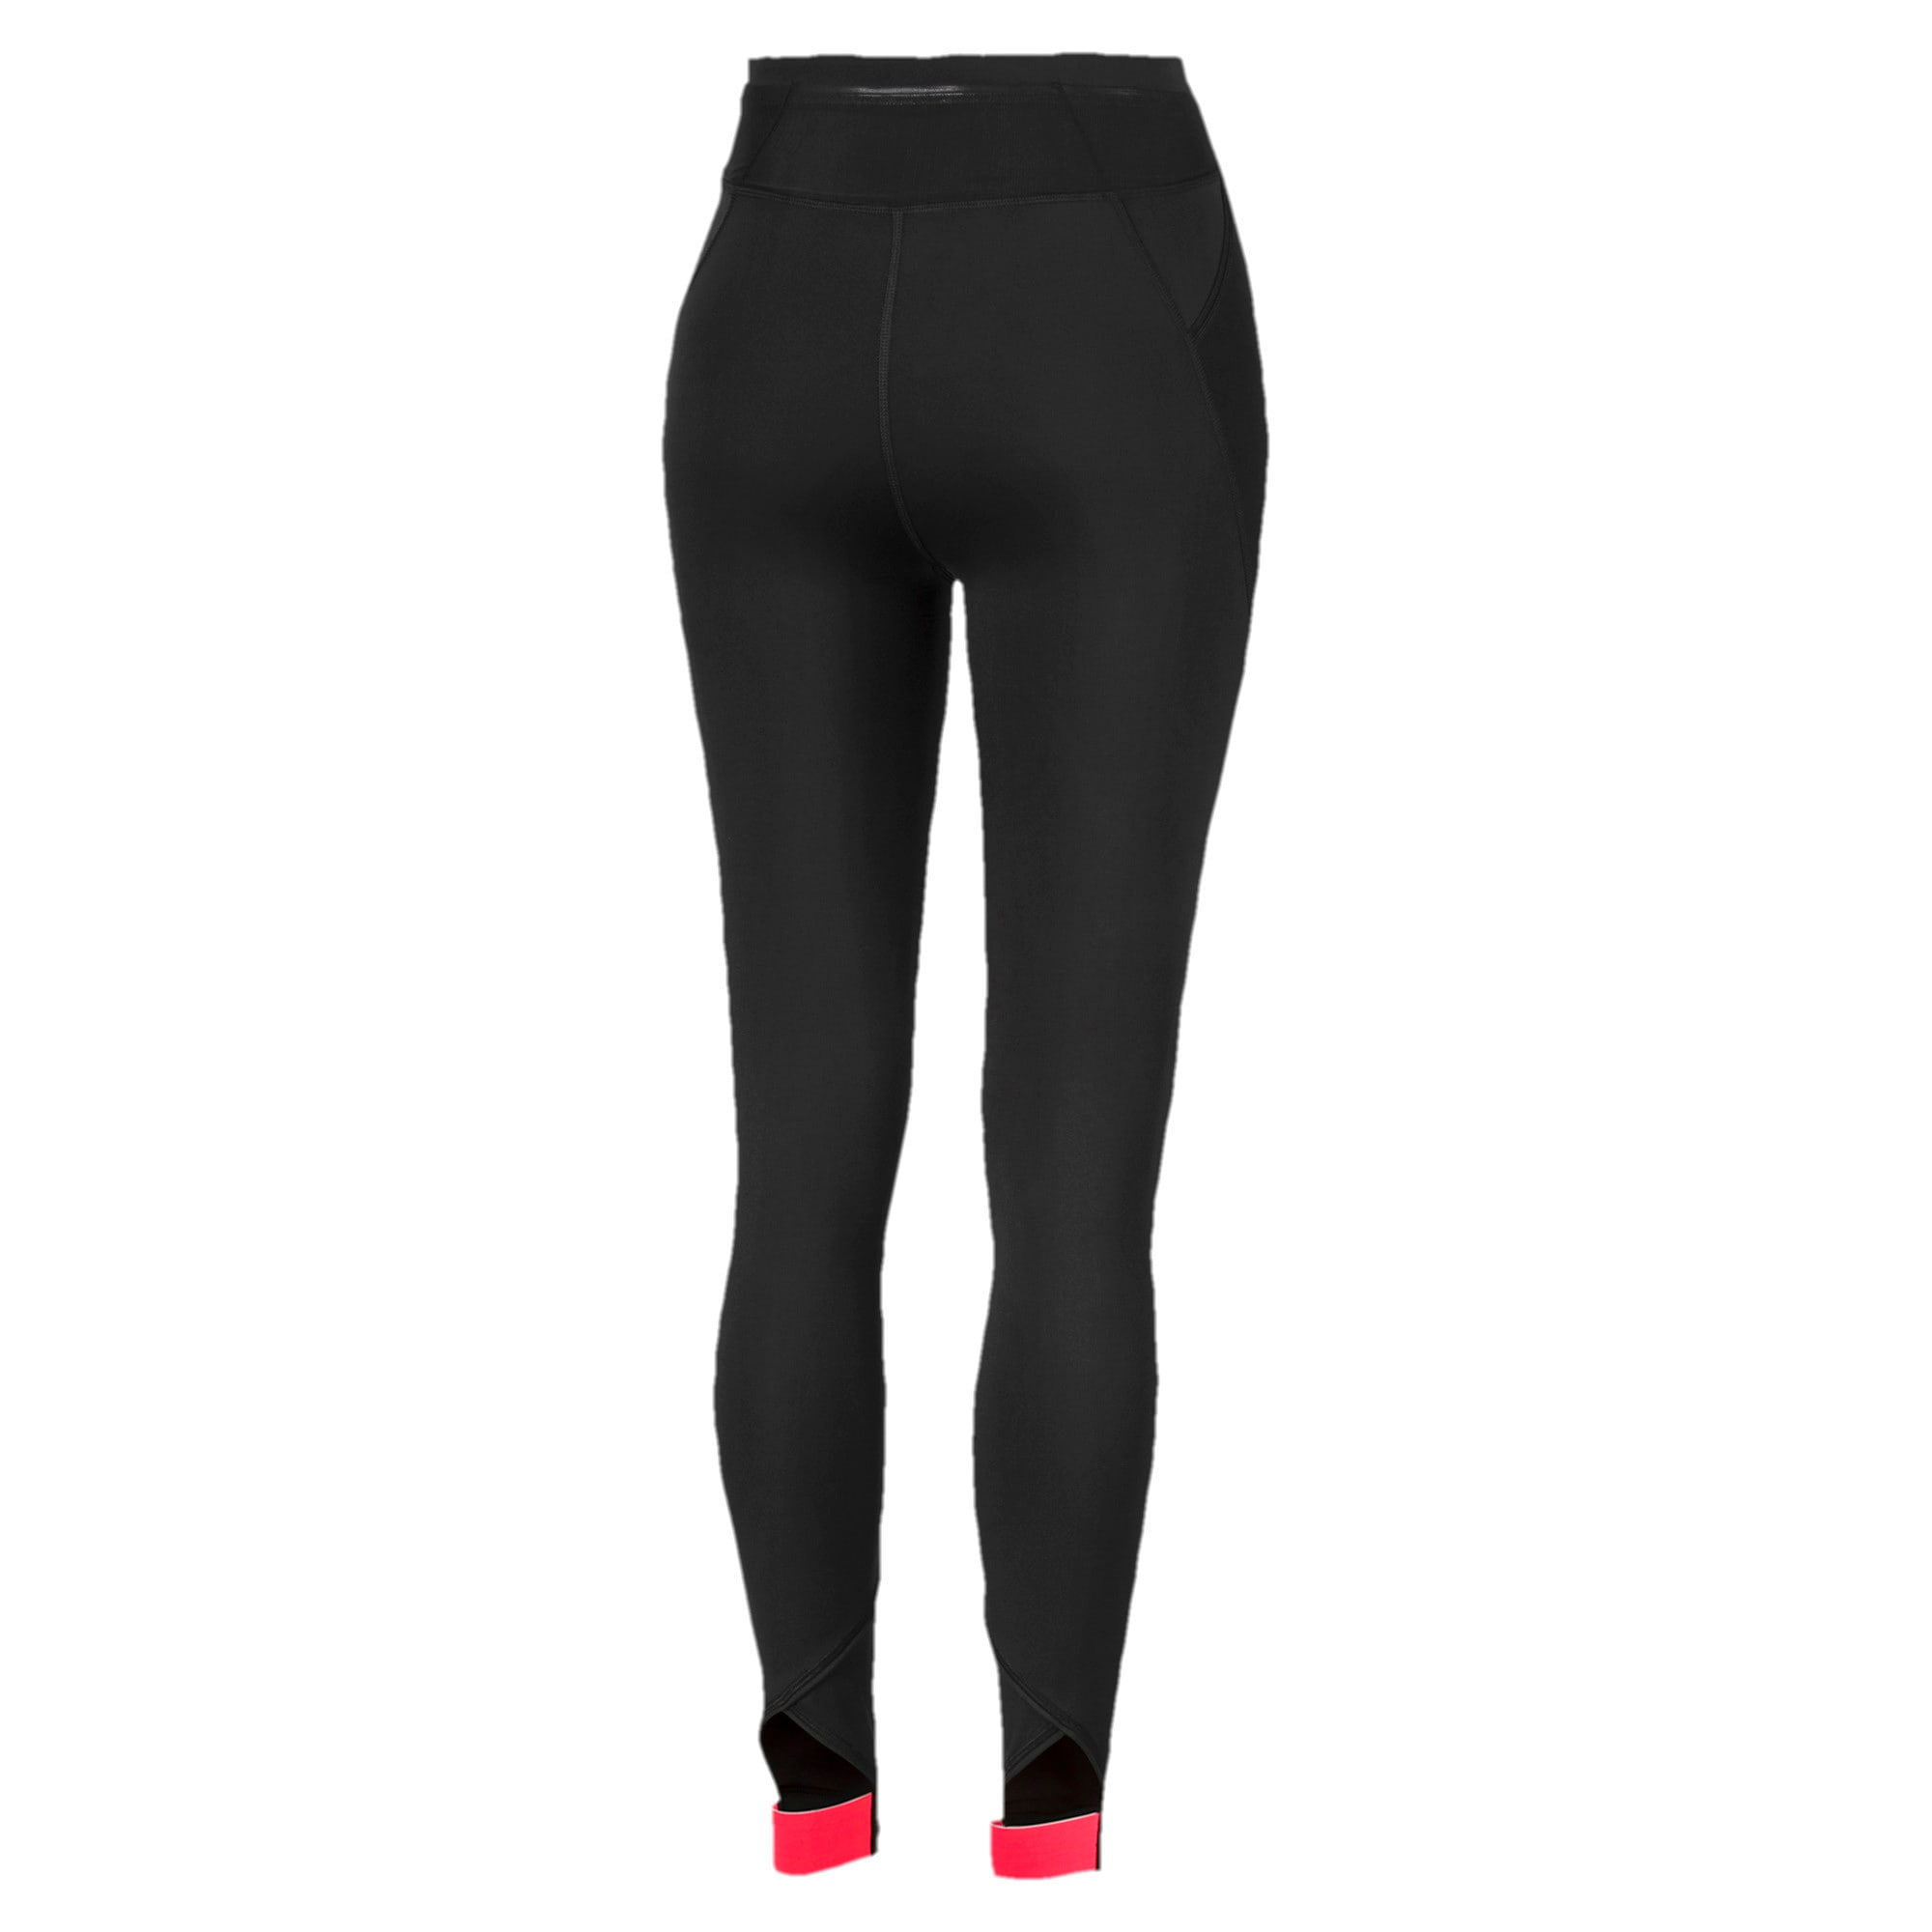 Thumbnail 5 of HIT Feel It 7/8 Women's Training Leggings, Puma Black-Pink Alert, medium-IND